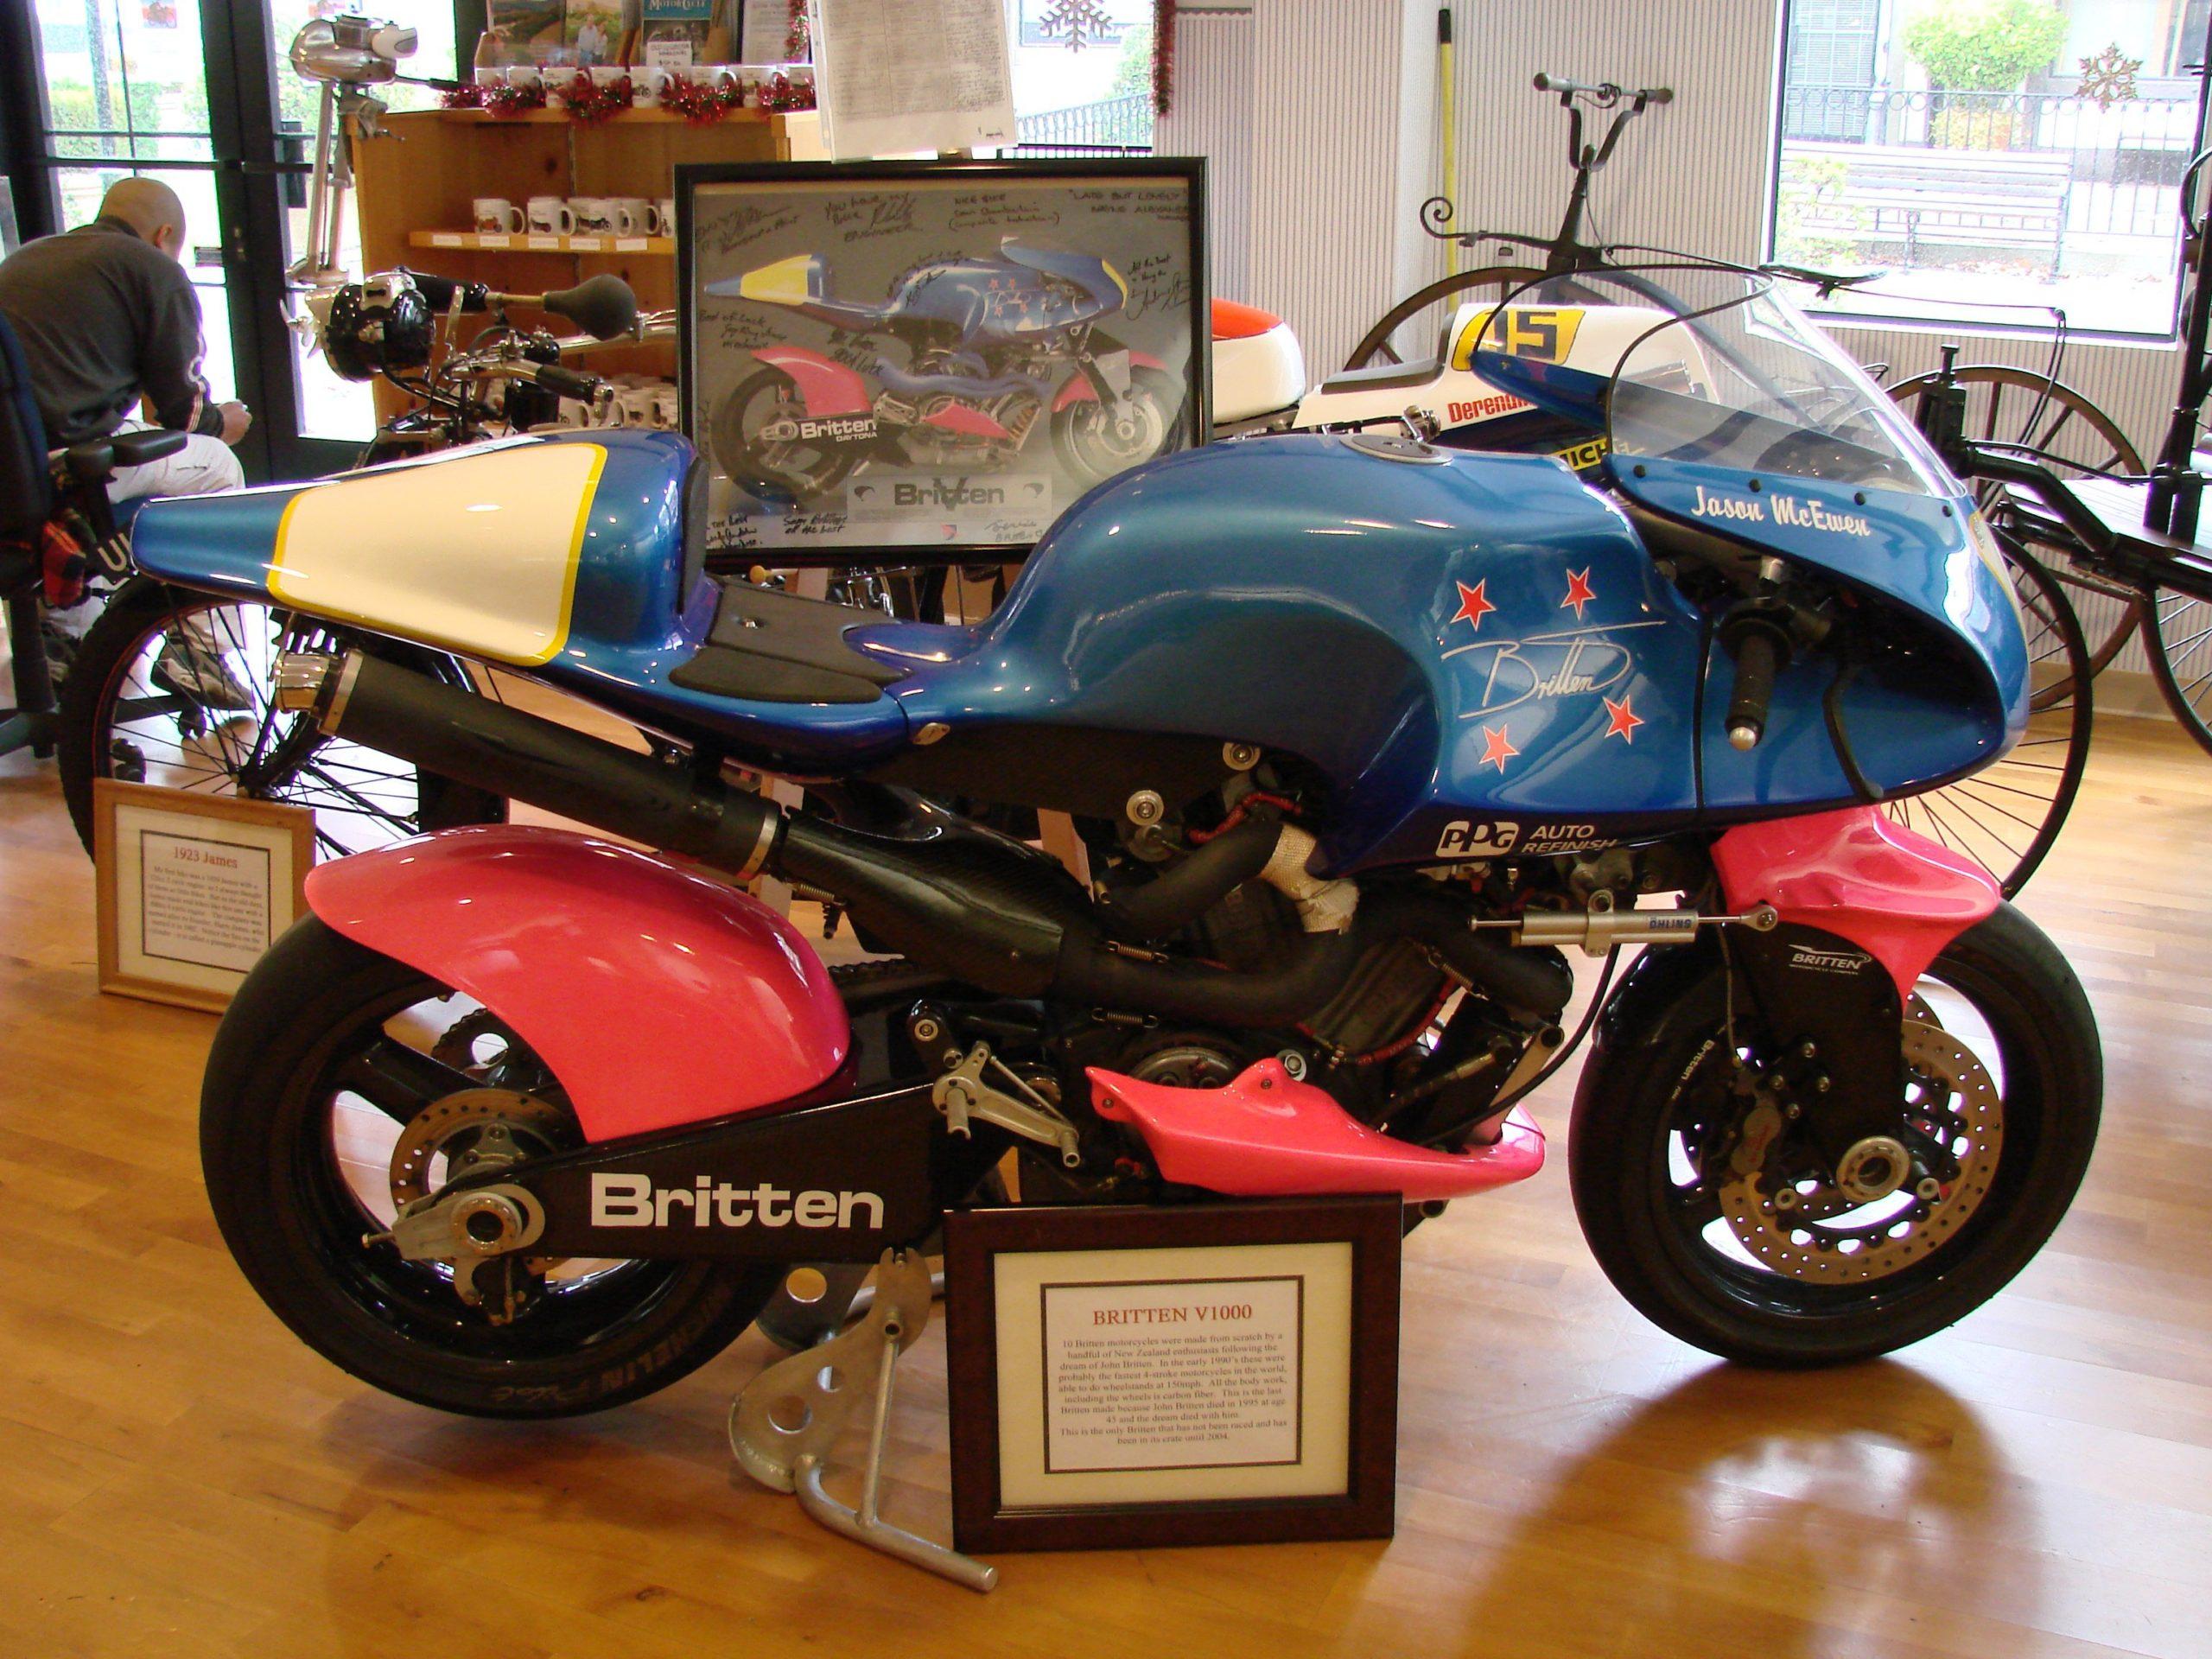 Britten V1000 - The Kiwi Brewed Champion 2